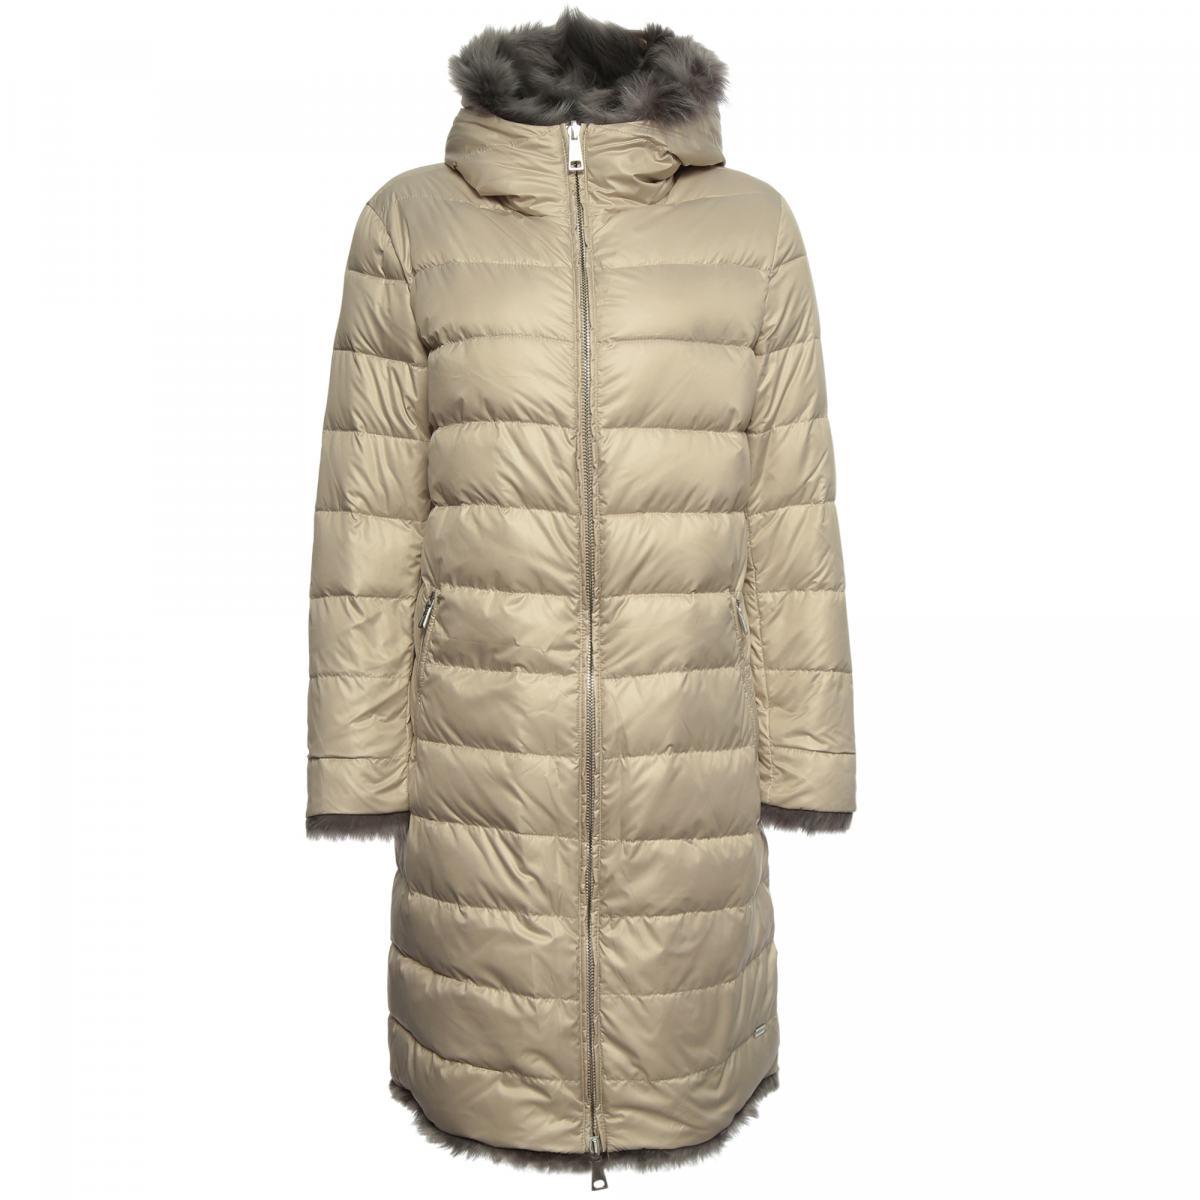 Пальто Baldinini бежевого цвета